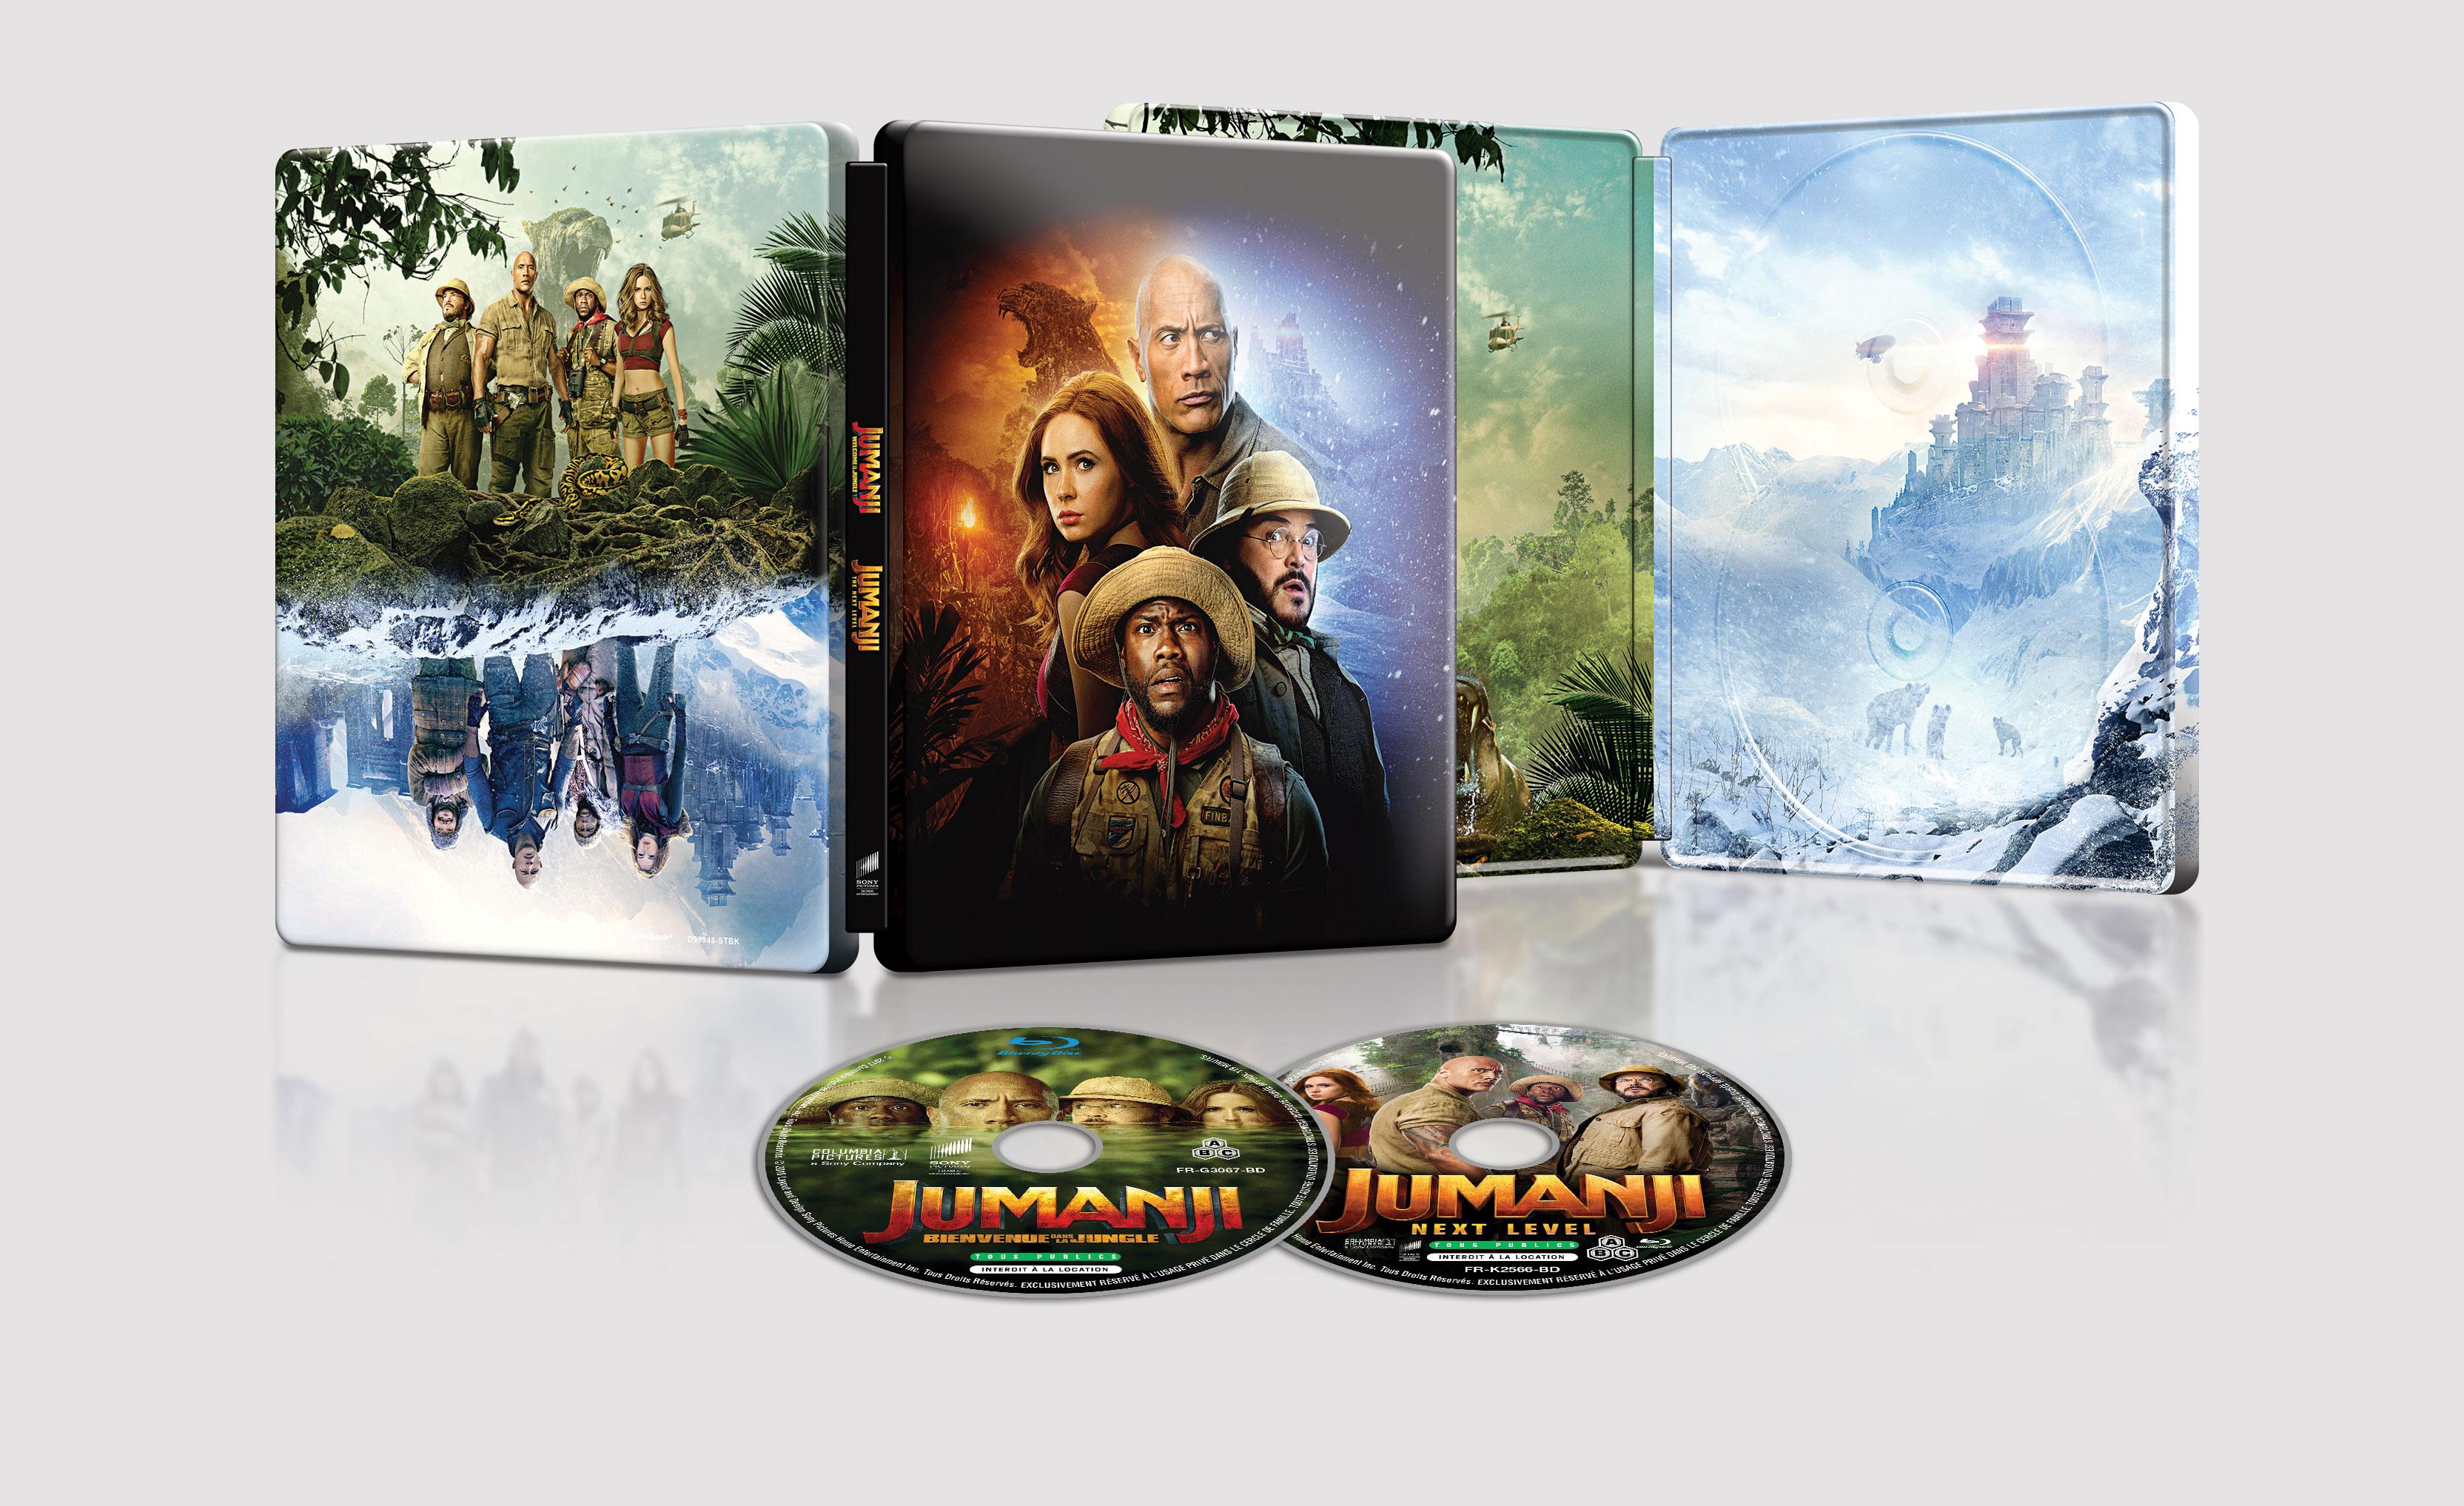 Jumanji 1-2. - Blu-ray Steelbook